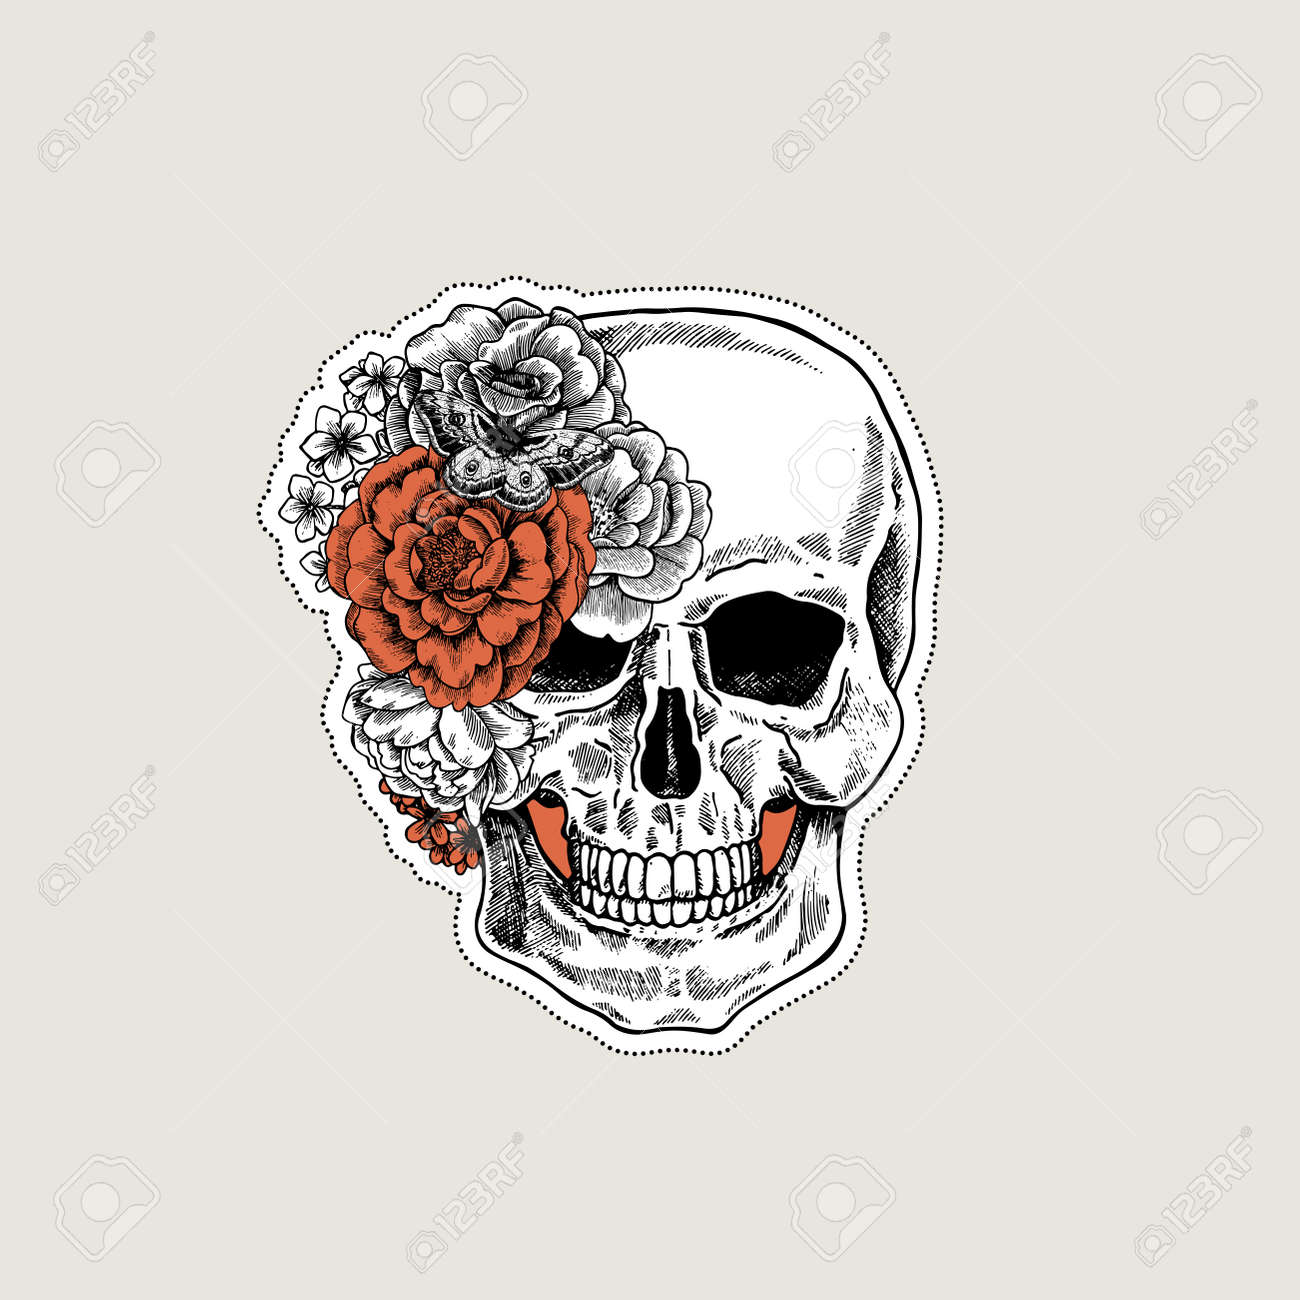 Floral Human Skull Tattoo Anatomy Vintage Illustration Vector